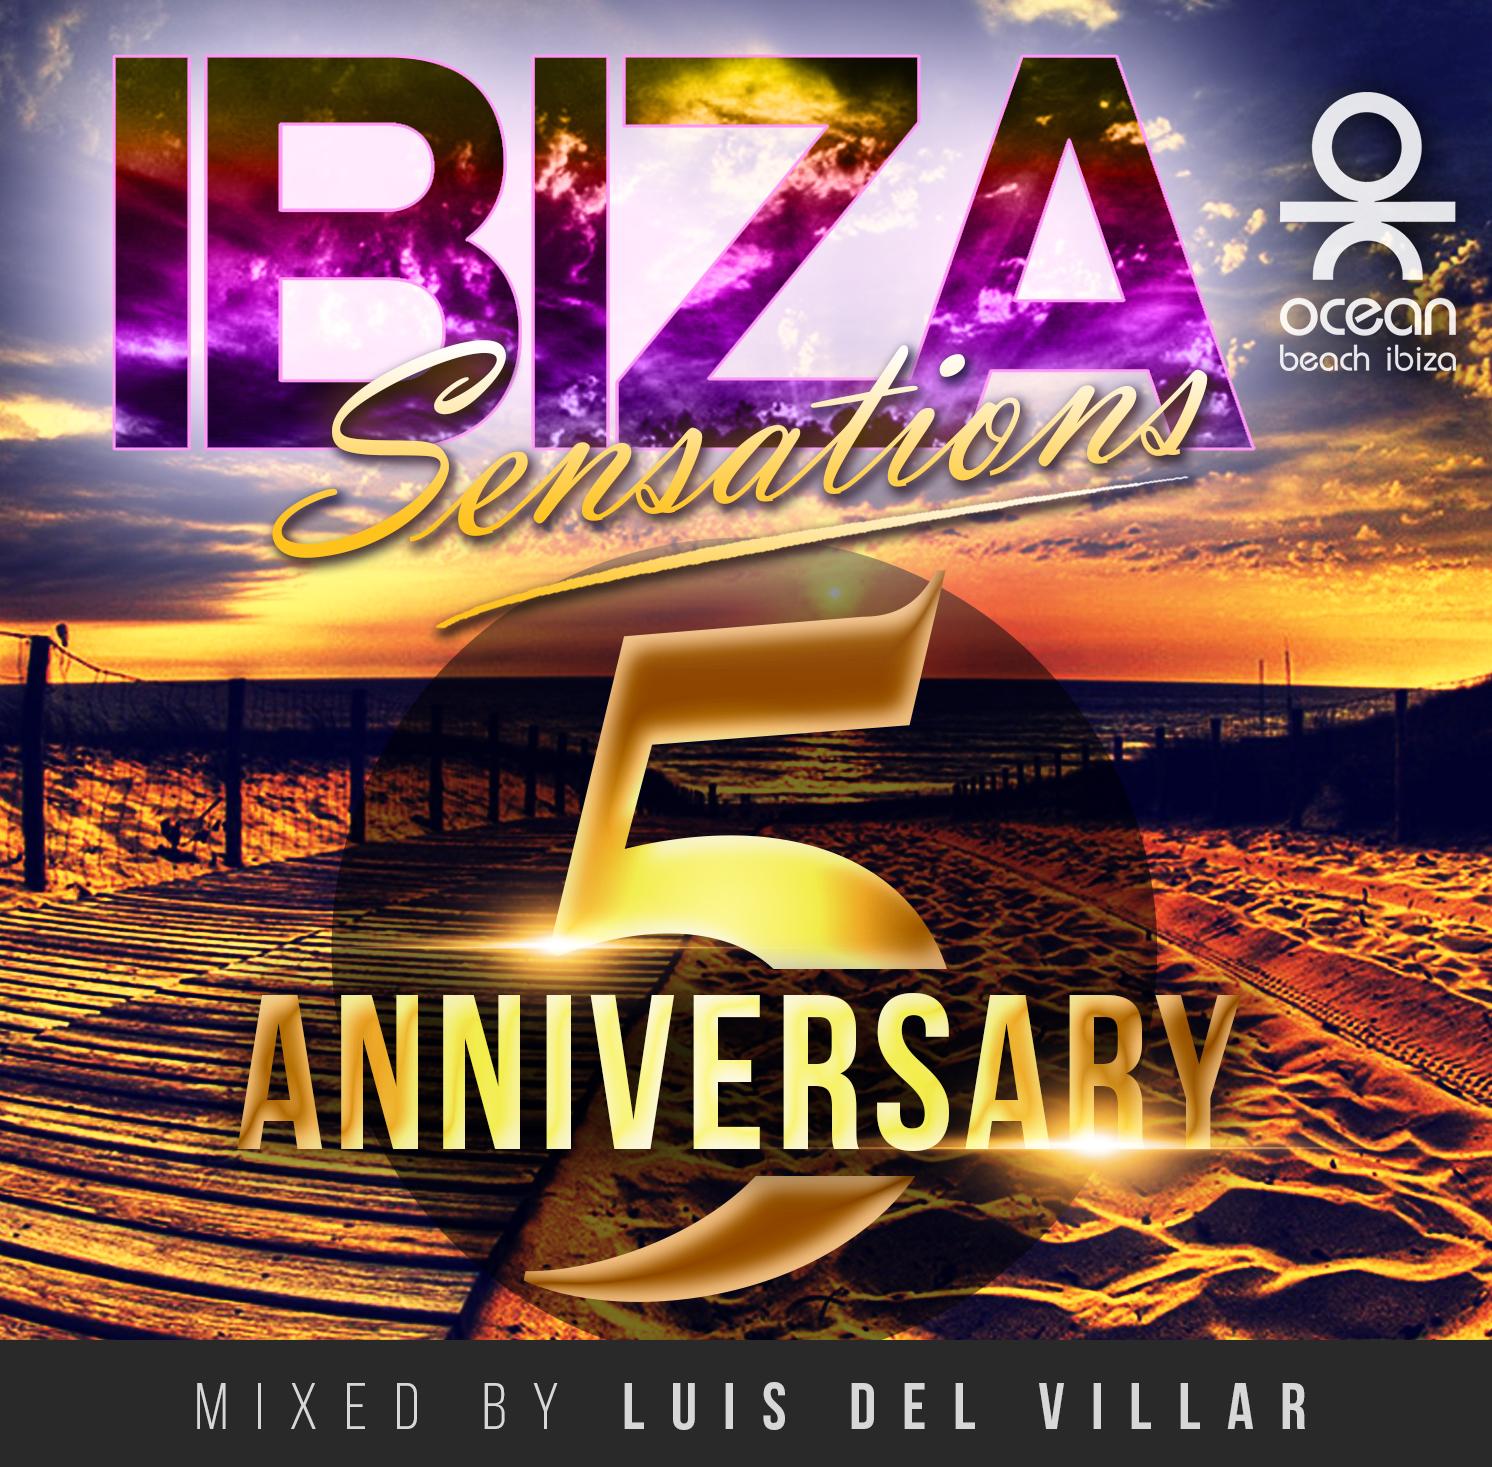 Artwork for Ibiza Sensations 117 5th Anniversary